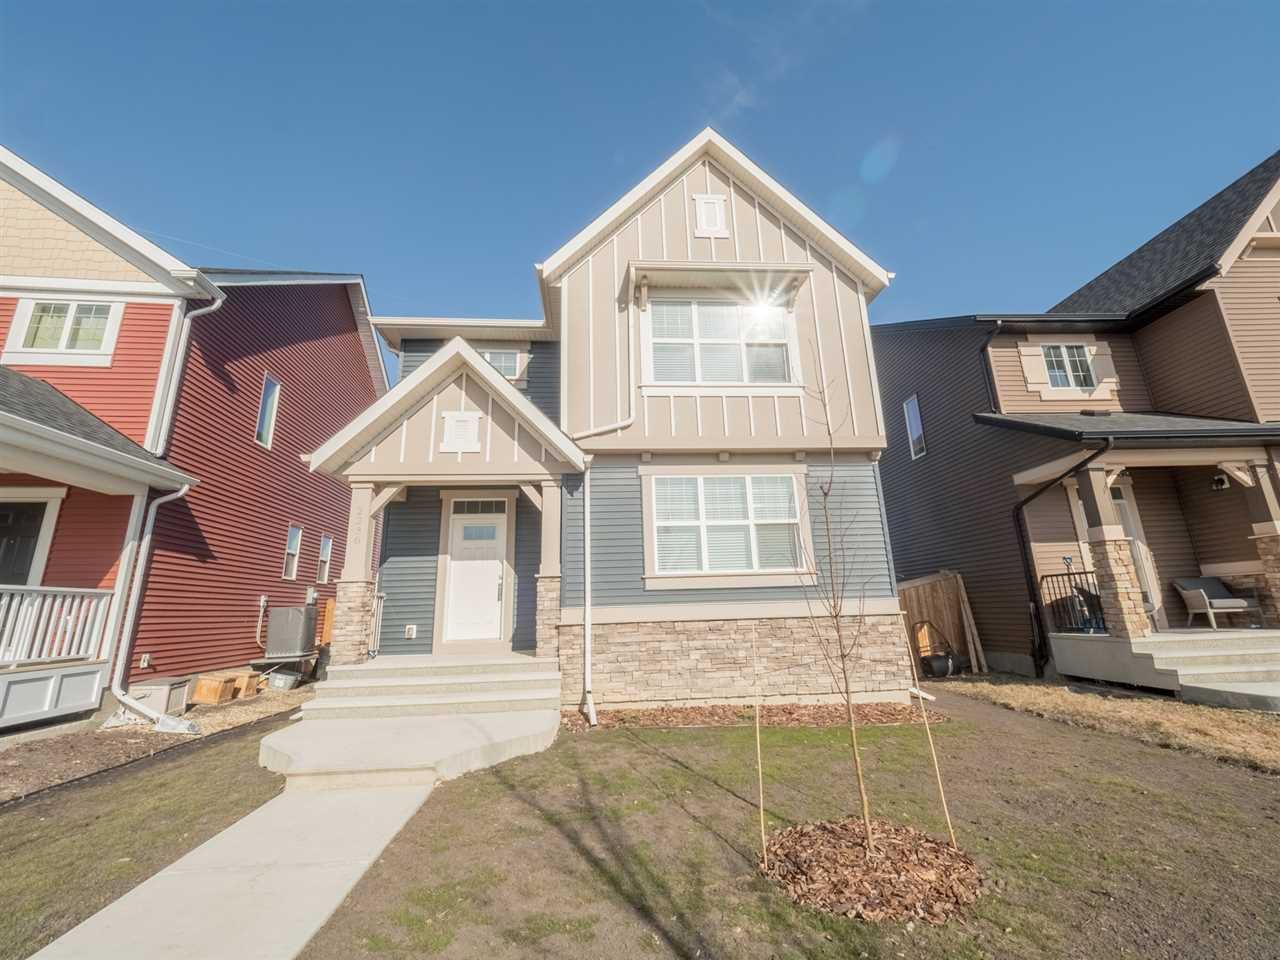 Main Photo: 2230 ASPEN Trail: Sherwood Park House for sale : MLS®# E4150563